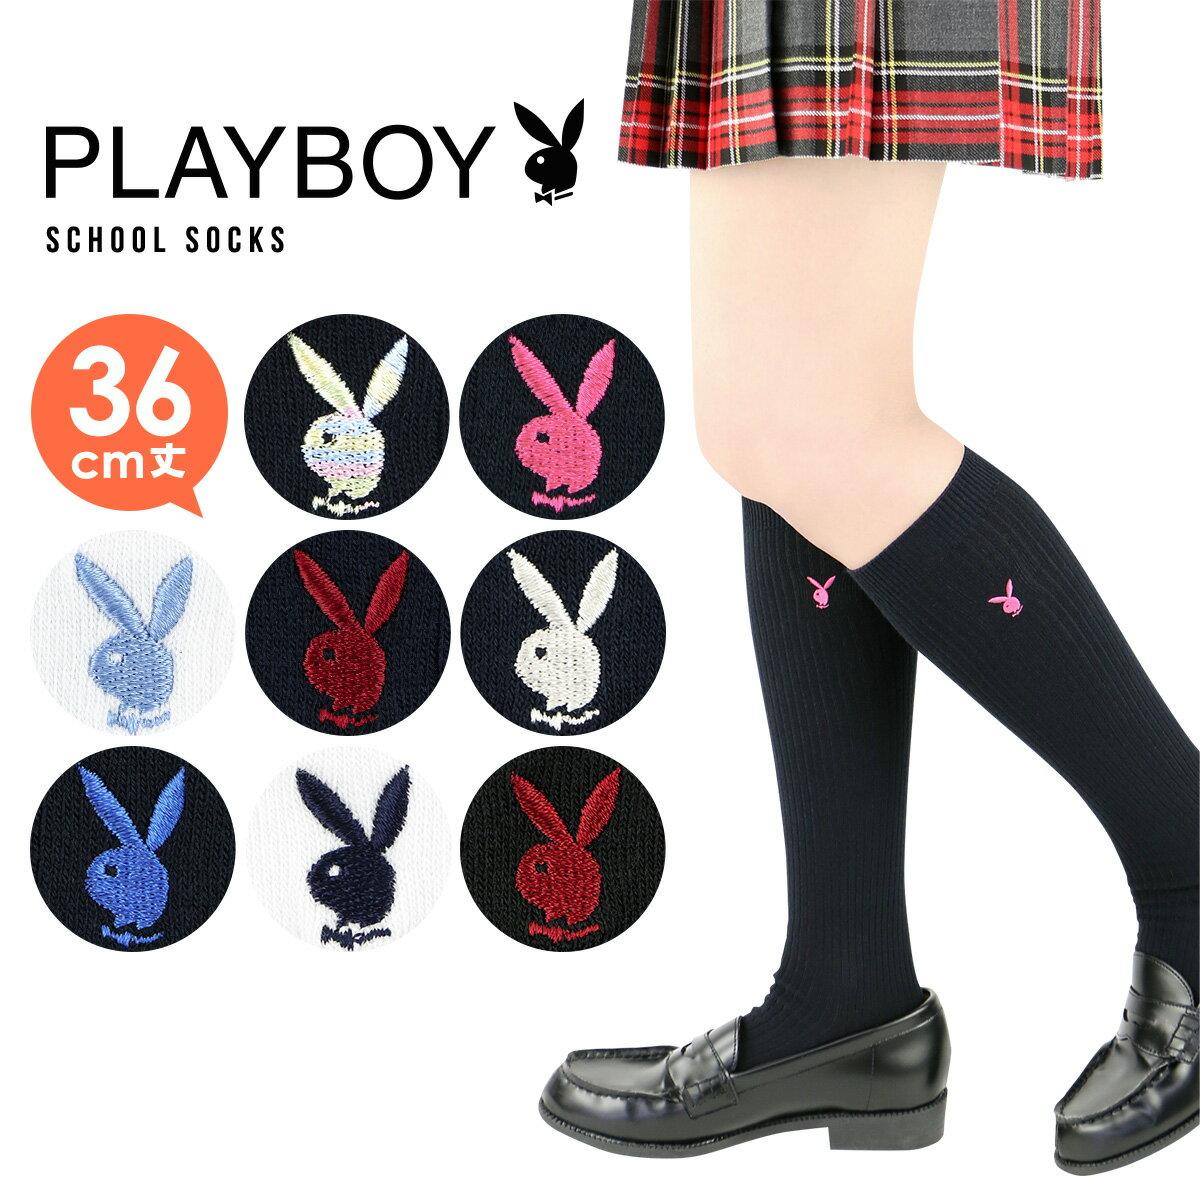 PLAYBOY (プレイボーイ) スクールソックス ワンポイント 両面刺繍 36cm丈 レディス ハイソックス 靴下 3737-354ポイント10倍